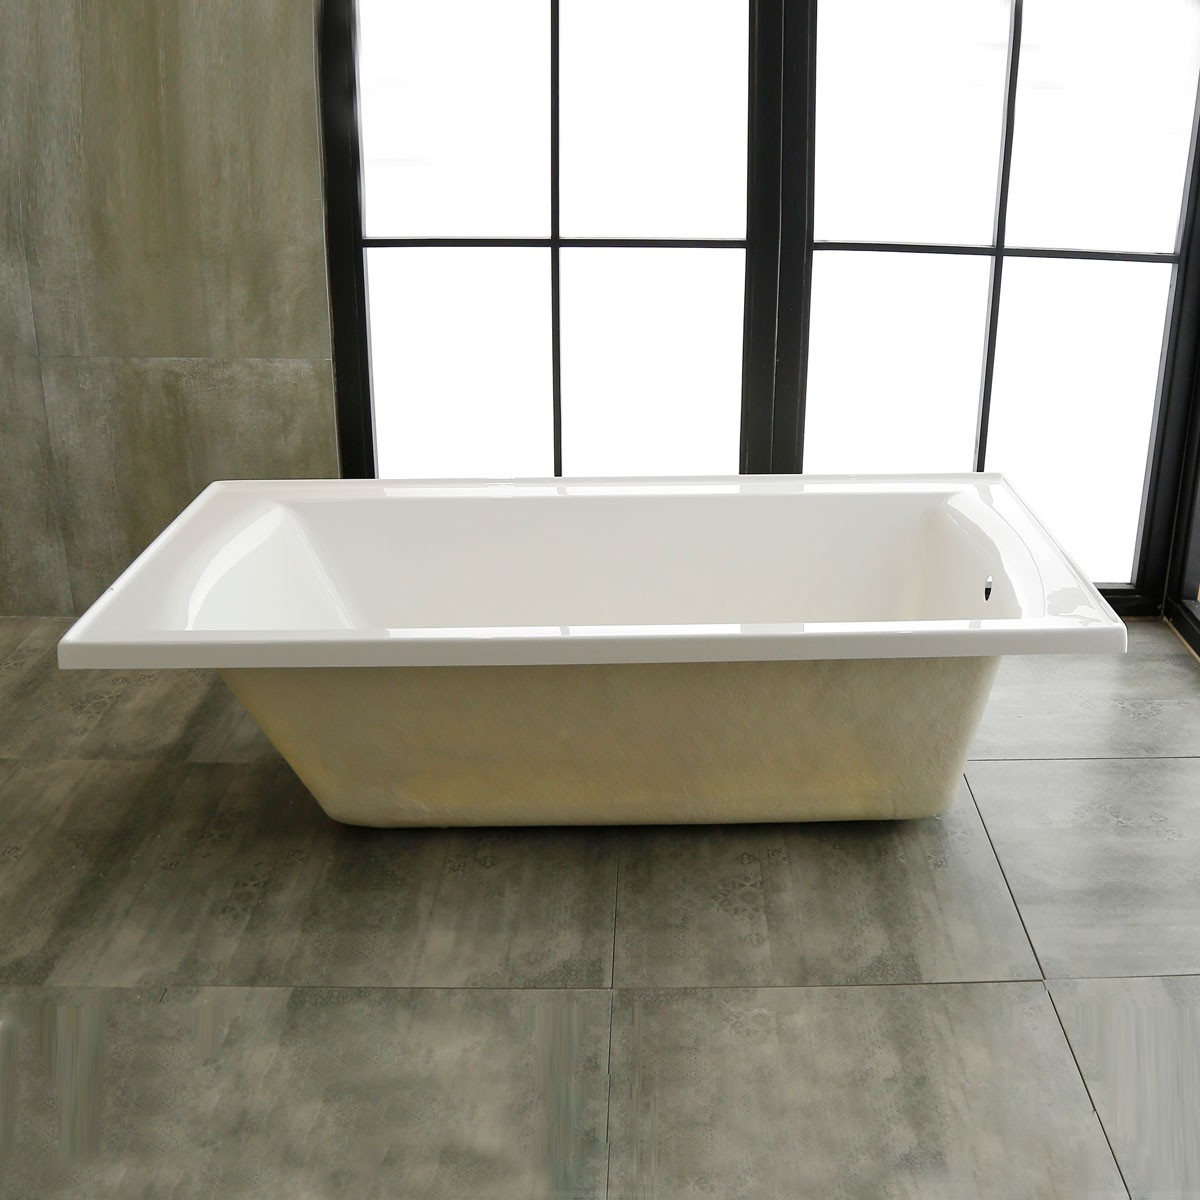 60 po baignoire encastrable blanche en acrylique de salle de bain dk 3358 decoraport canada Baignoire acrylique salle bains